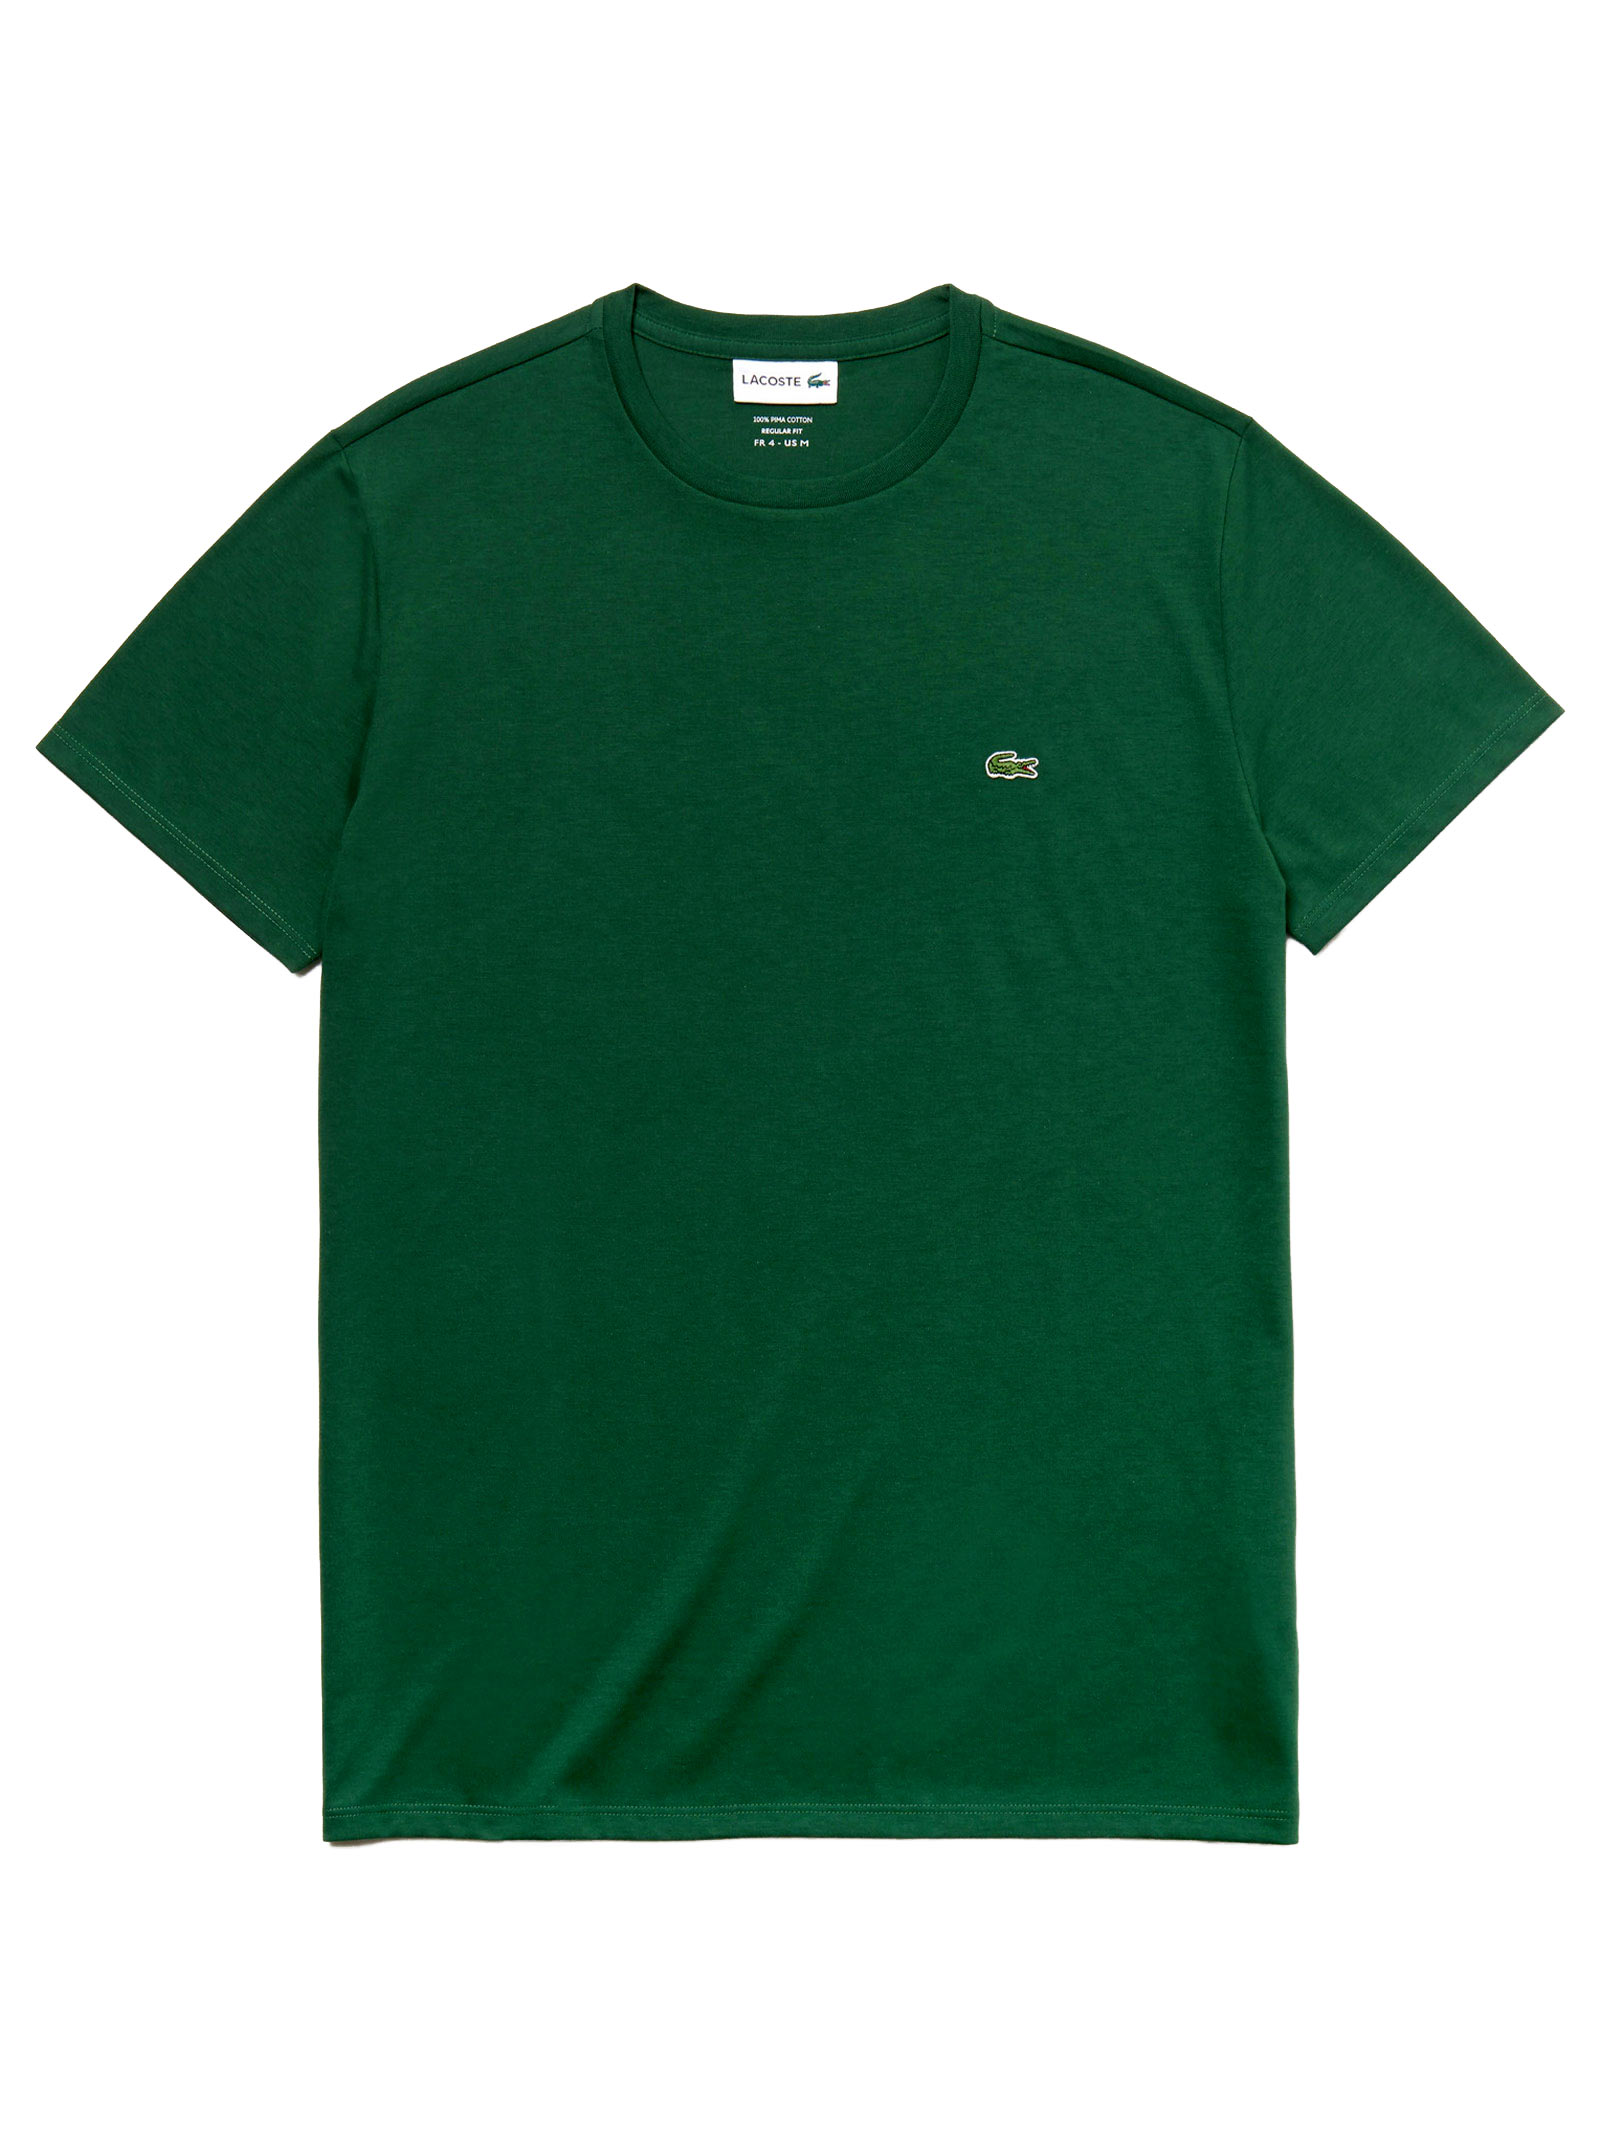 T-shirt a girocollo verde LACOSTE | T-shirt | TH6709132